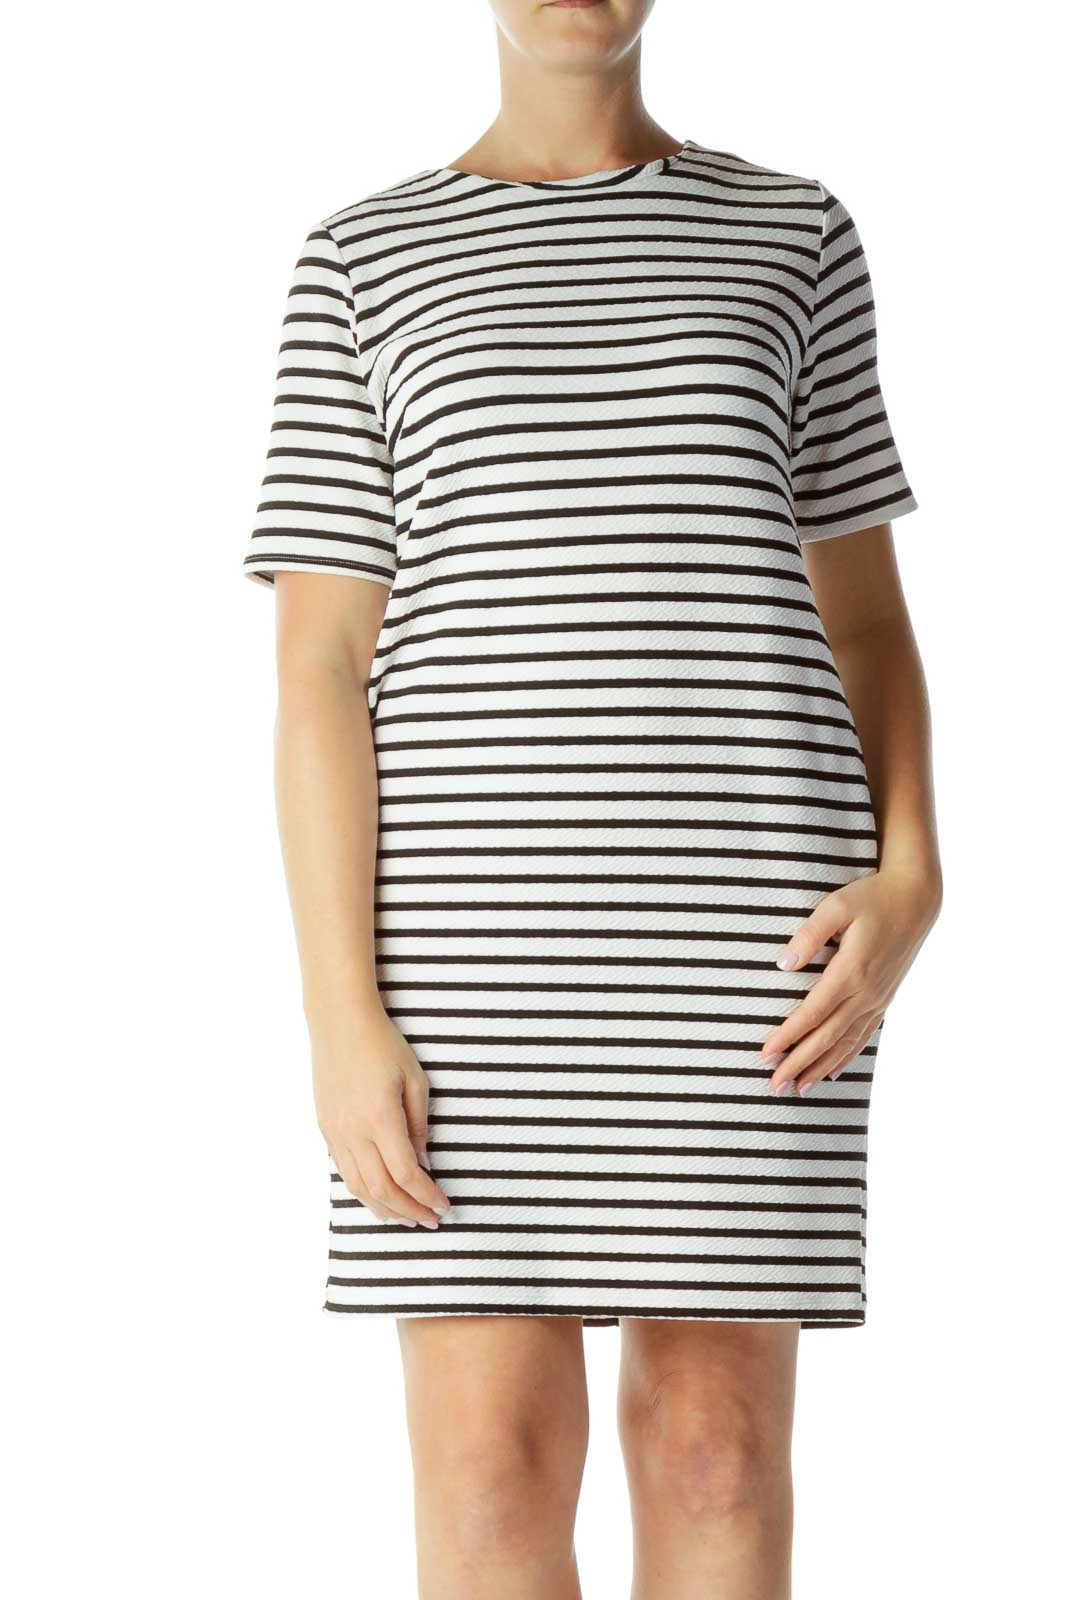 White Black Striped Day Dress Front